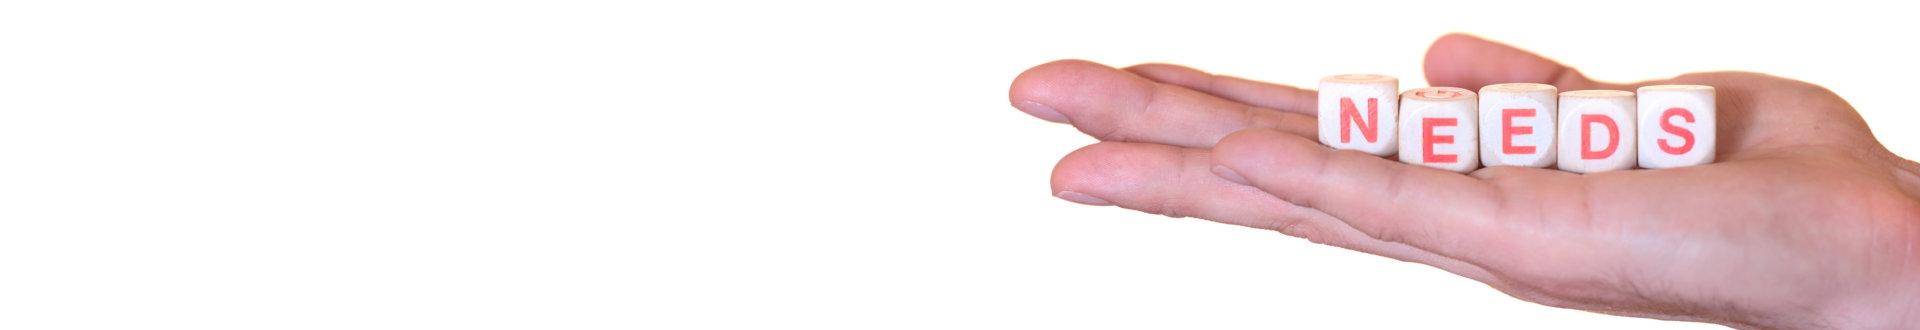 hand holding text blocks